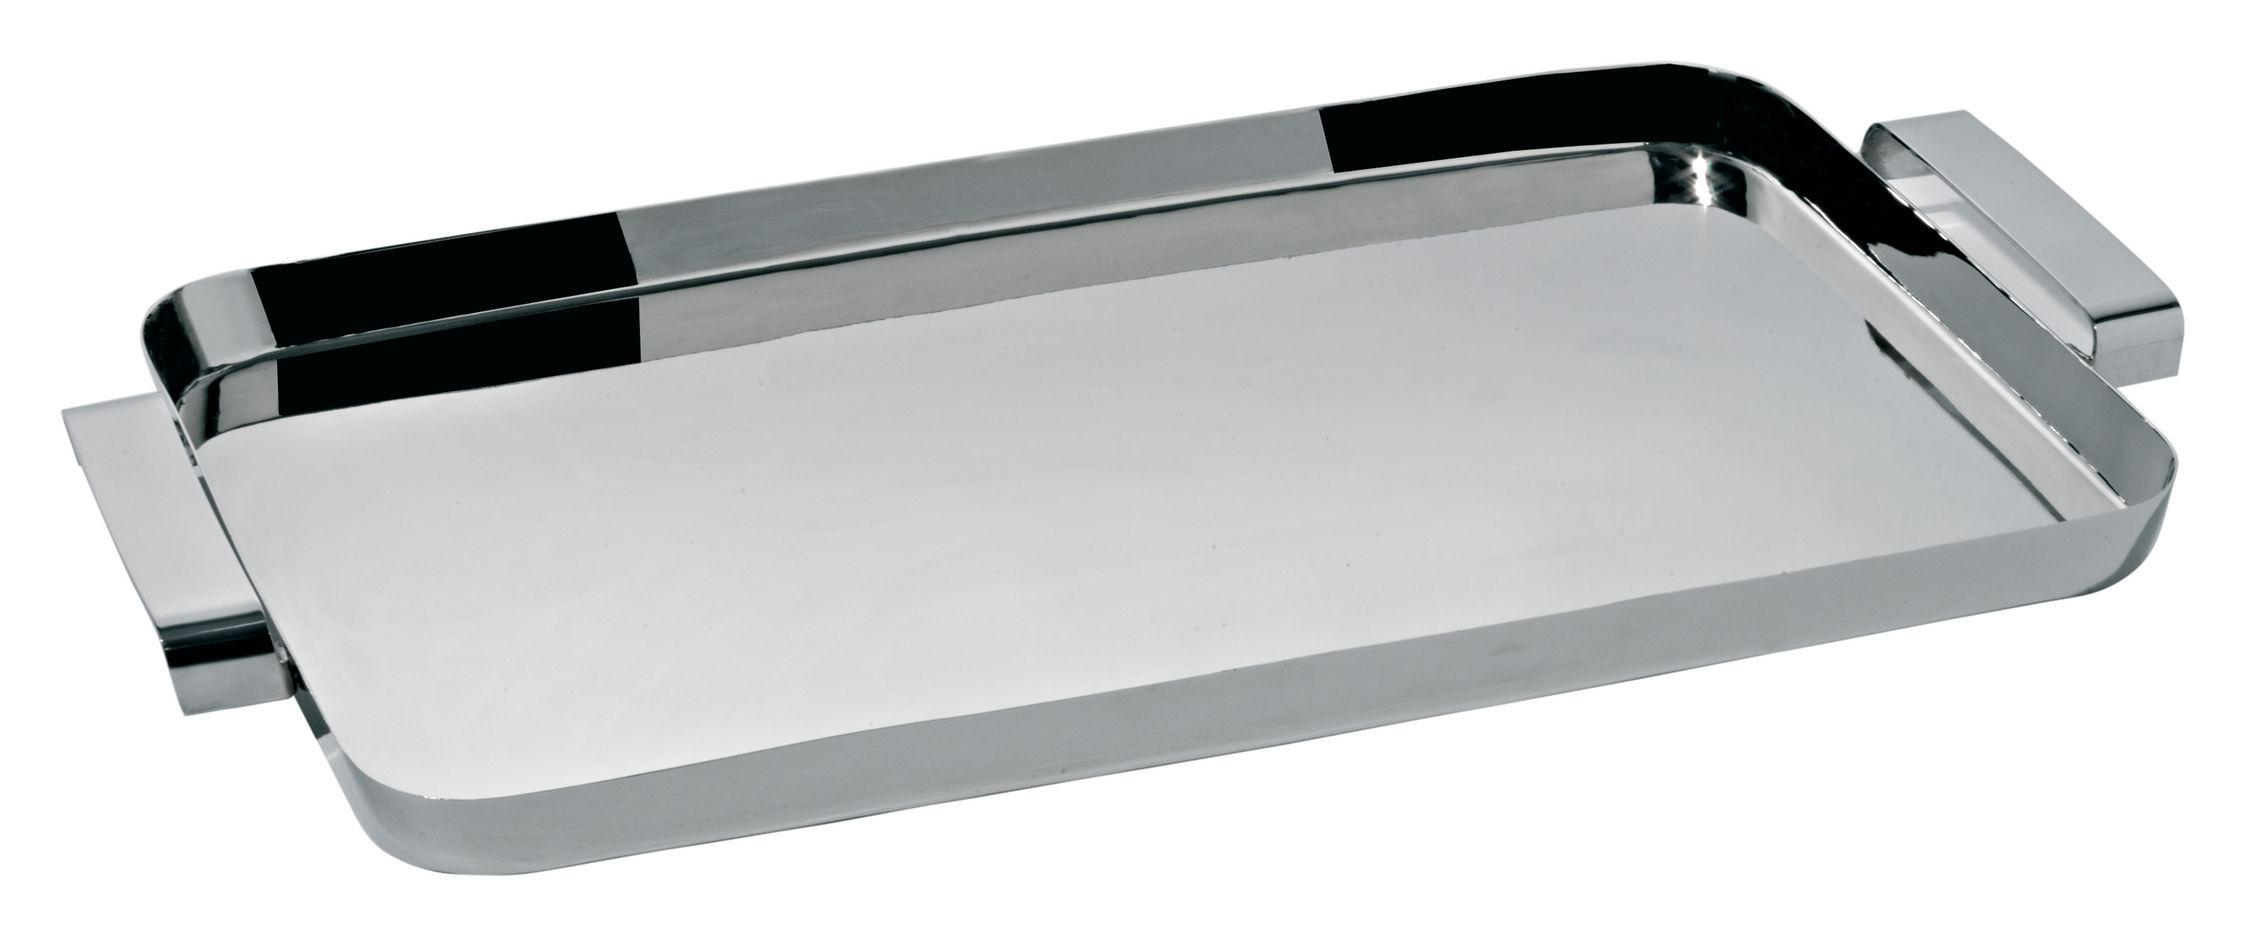 Arts de la table - Plateaux - Plateau Tau / 54 x 32 cm - Alessi - Inox - Acier inoxydable